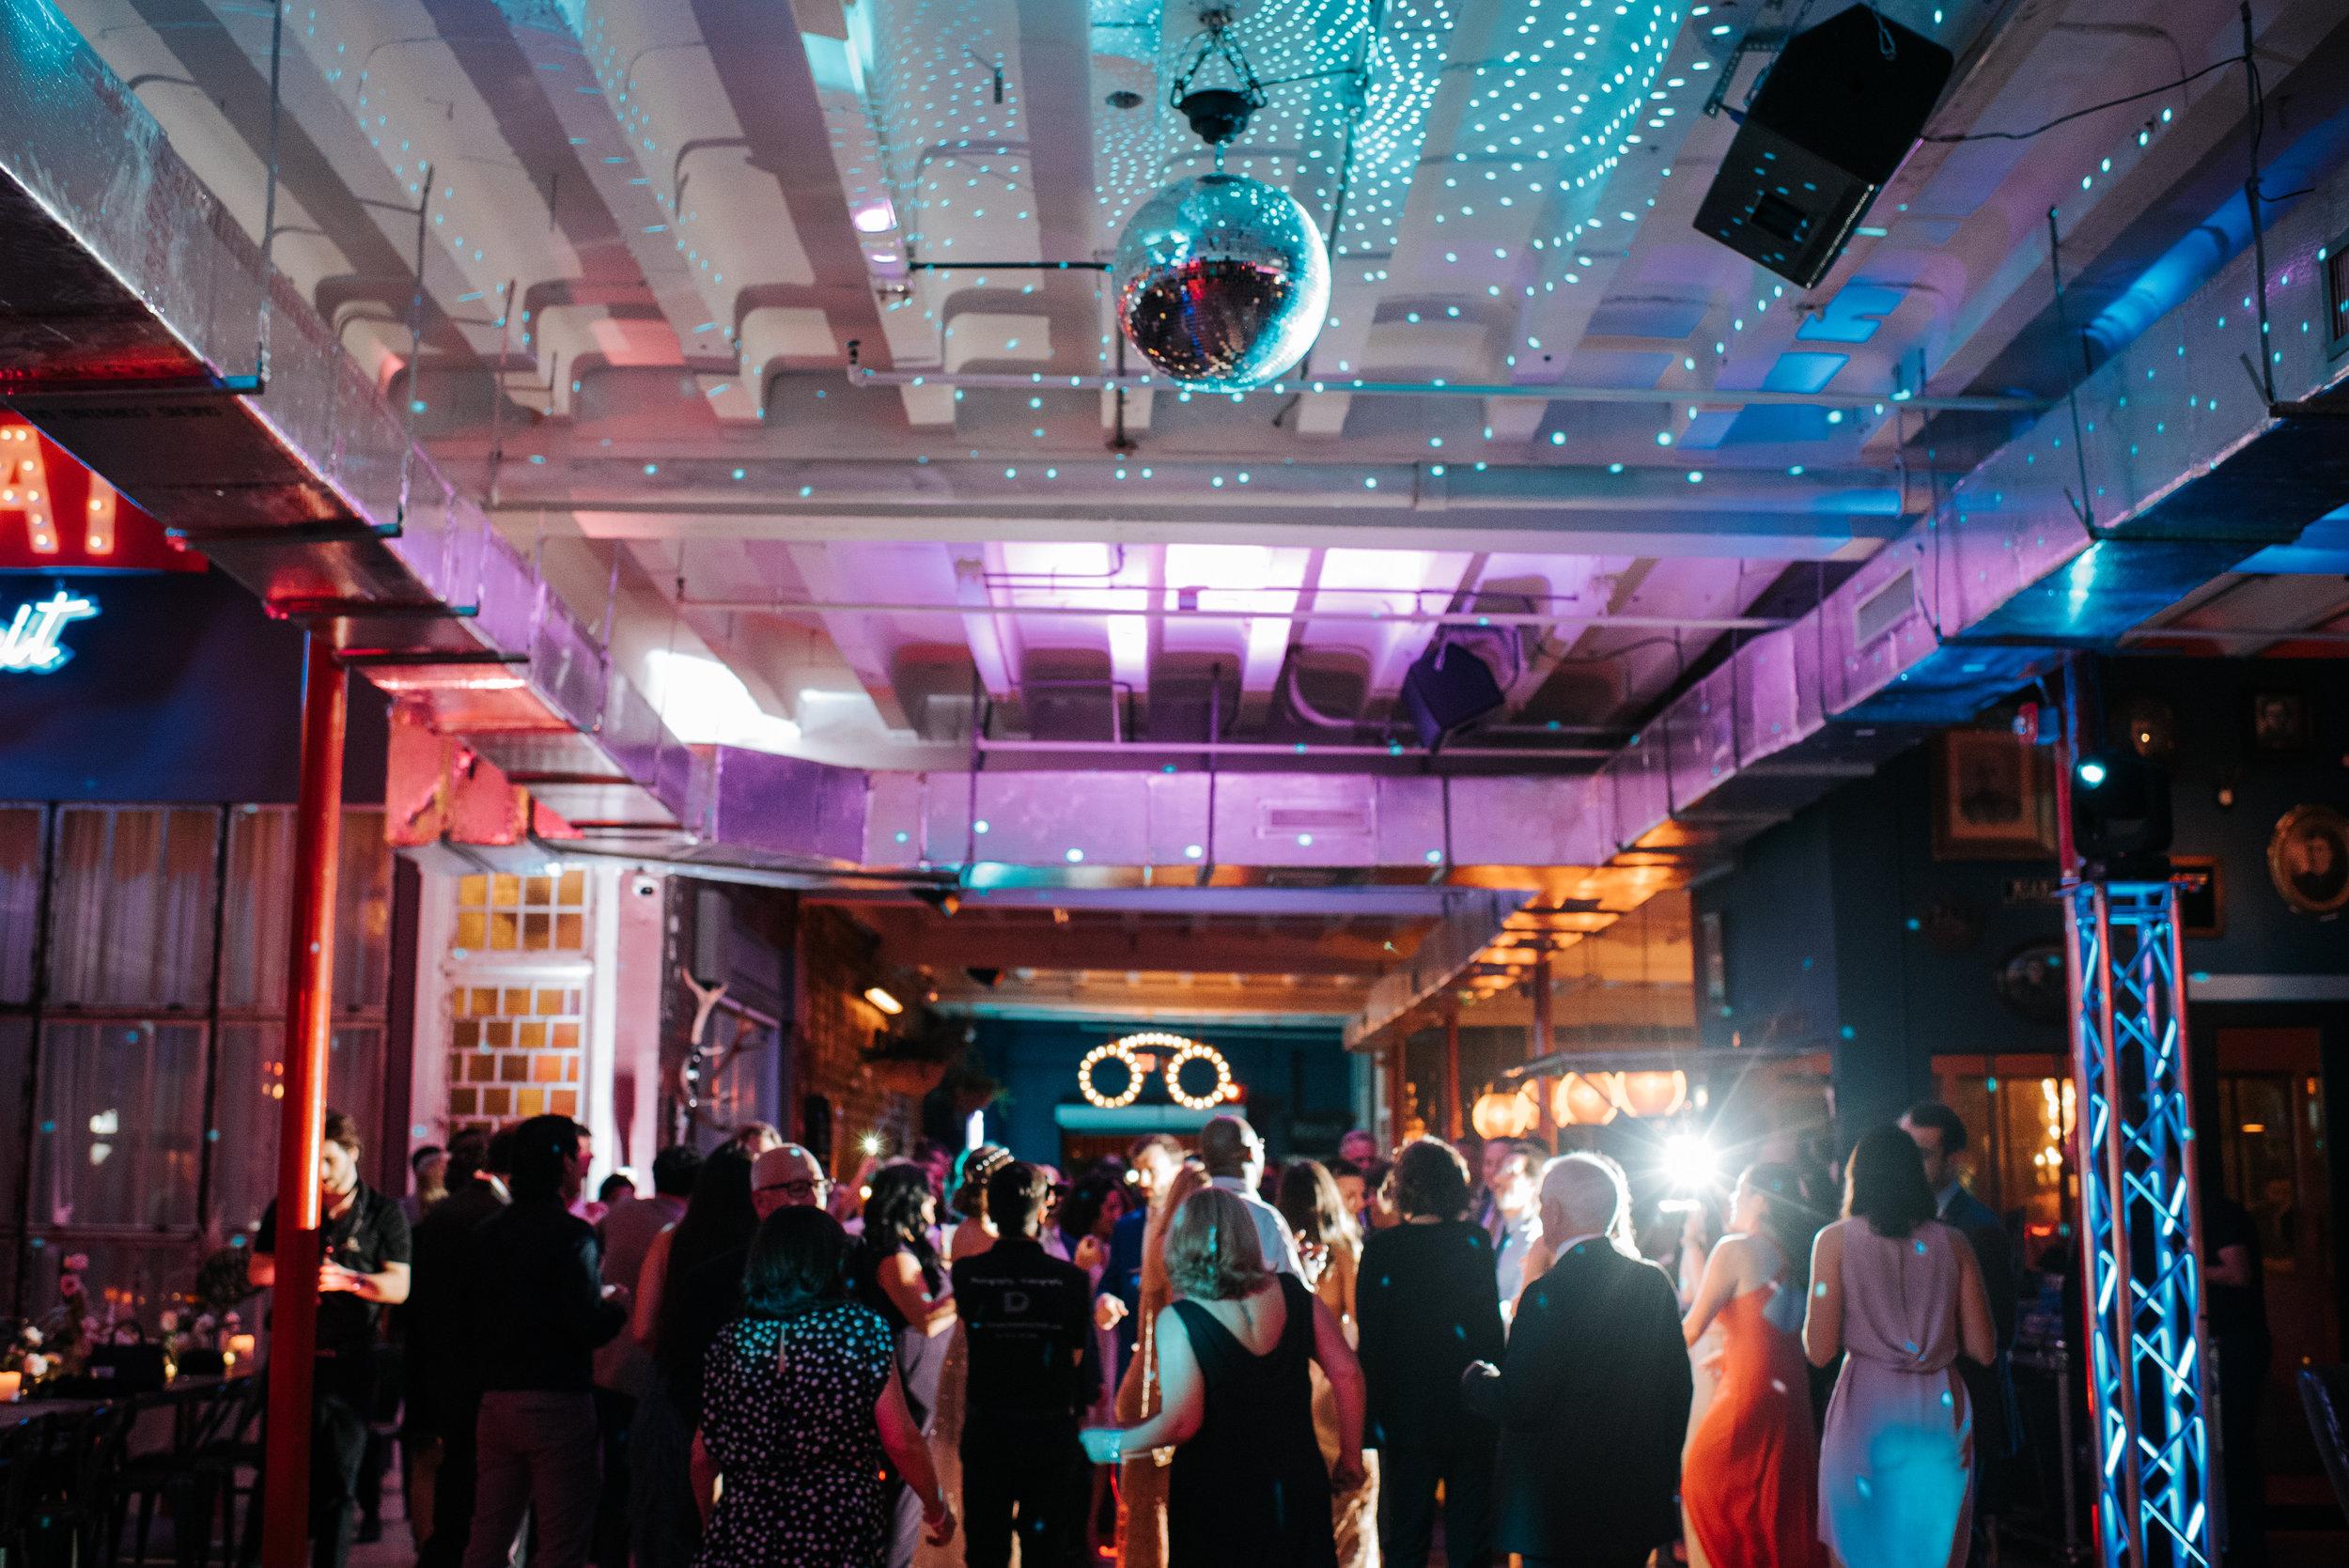 stephanie-bobby-ace-prop-house-miami-florida-wedding-1307.jpg